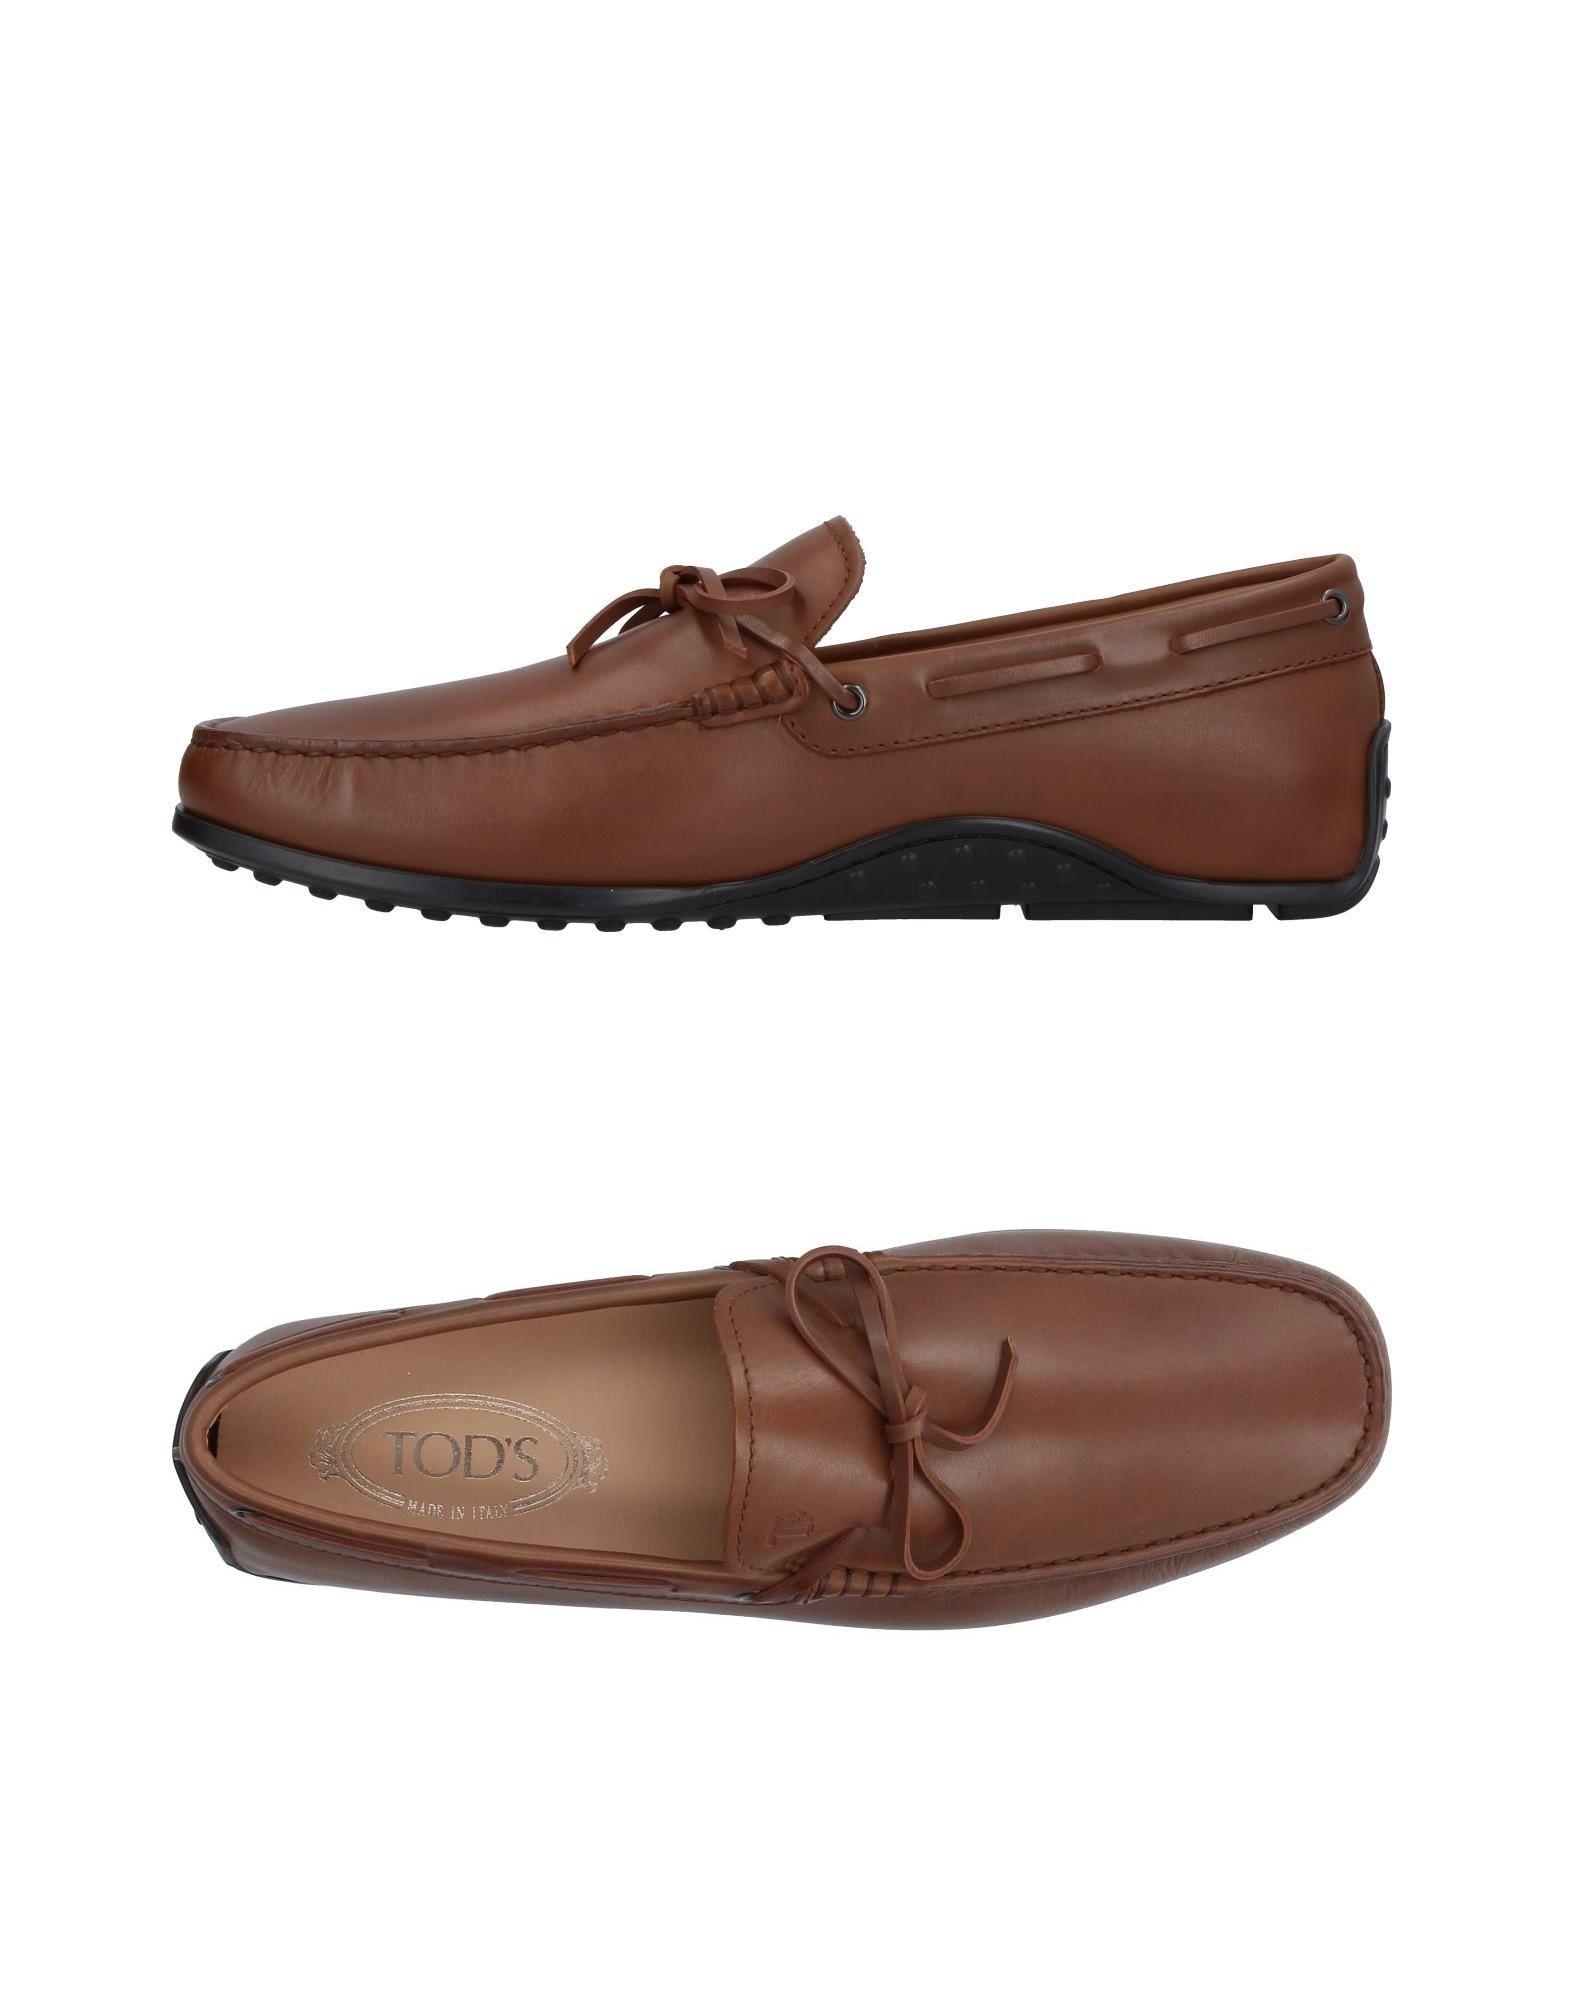 Tod's Mokassins Herren  11398938VS Gute Qualität beliebte Schuhe